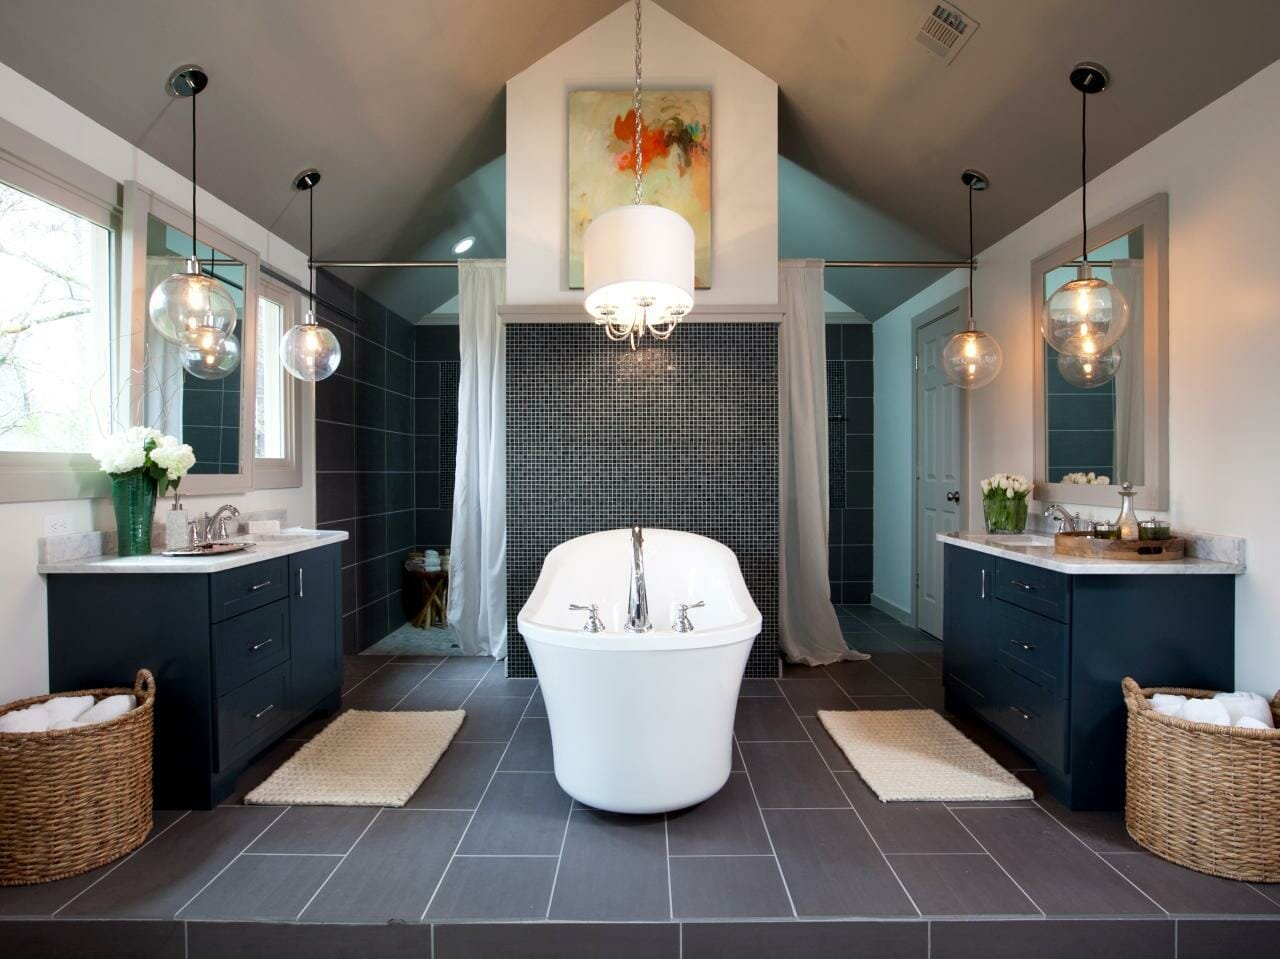 Over the tub lighting interior design in bathroom